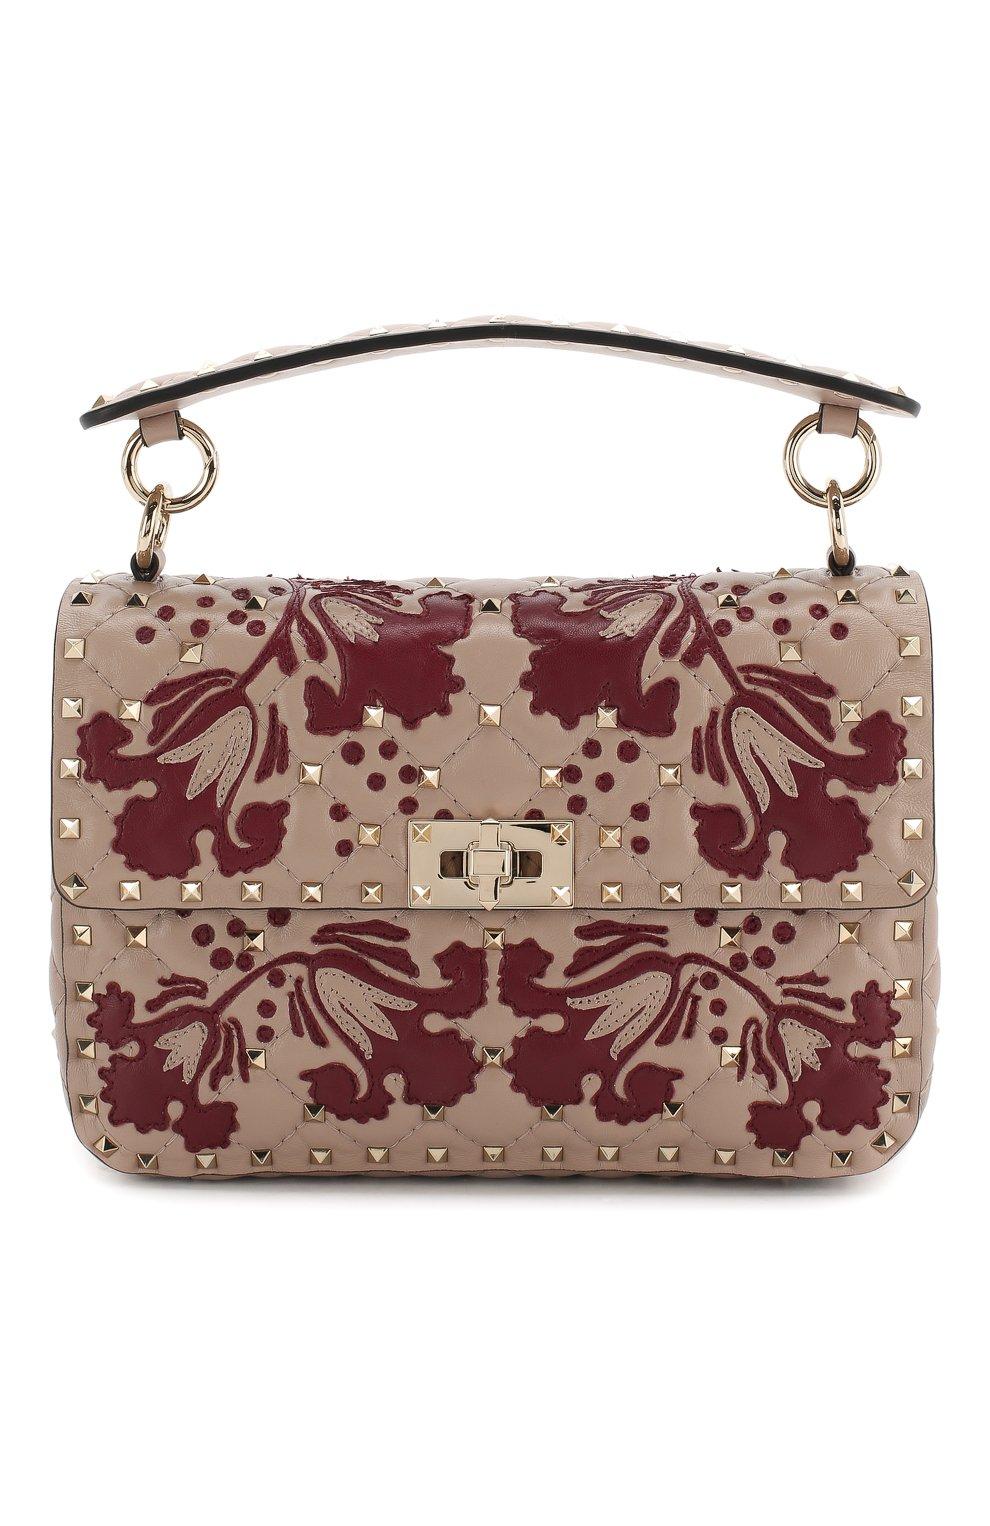 6cb9e15ac3f4 Женская сумка valentino garavani spike.it VALENTINO бежевая цвета ...